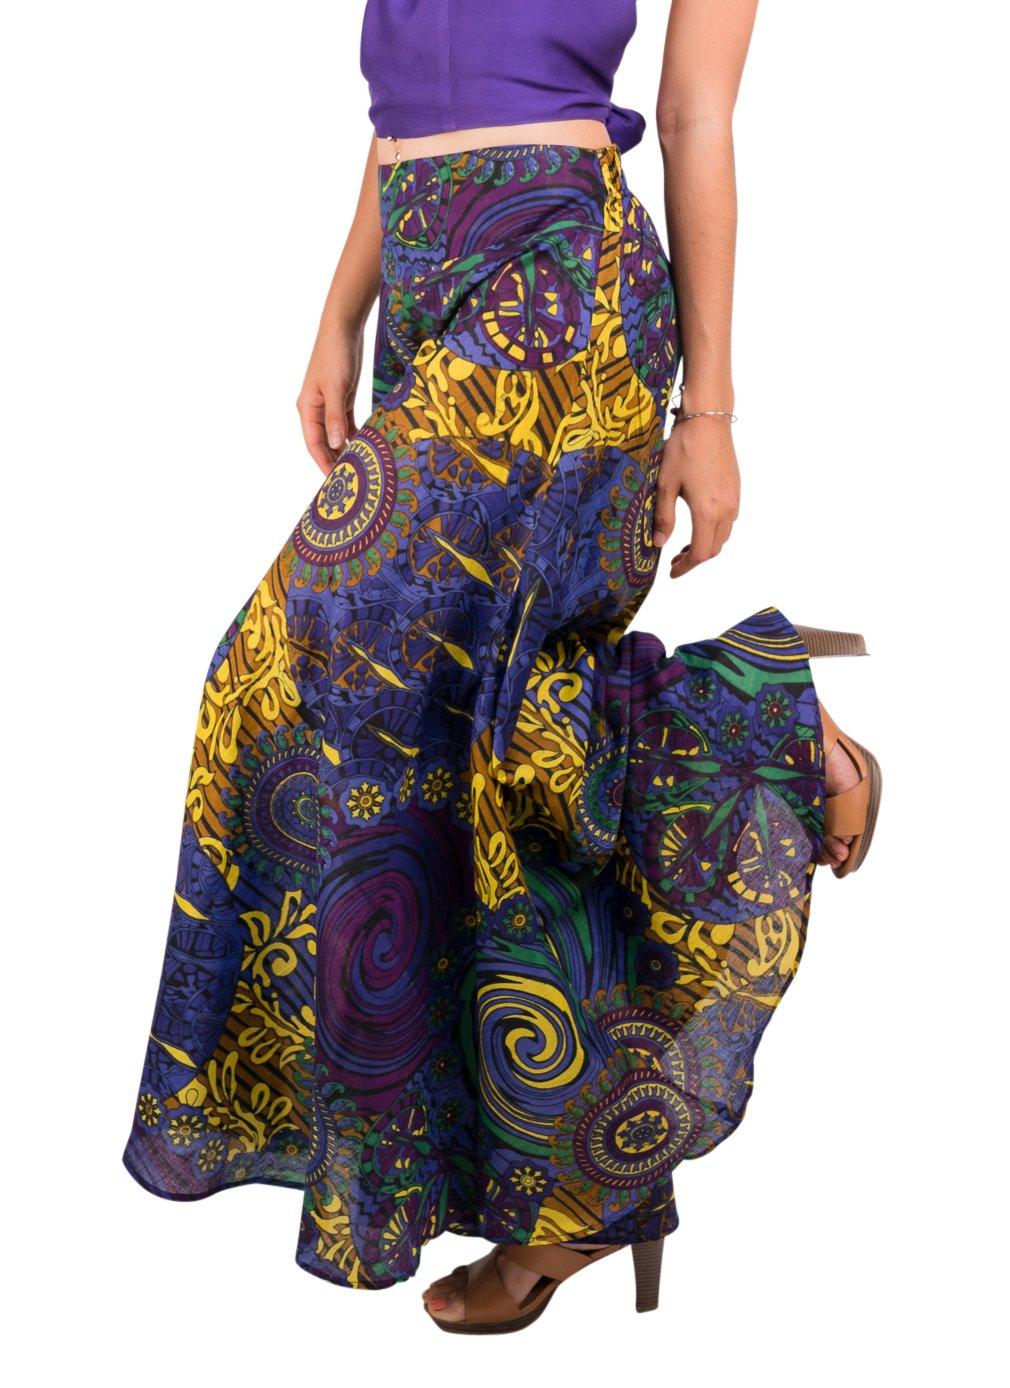 Tropic Bliss Women's Palazzo Pant, Dark Purple Hippie Style XL